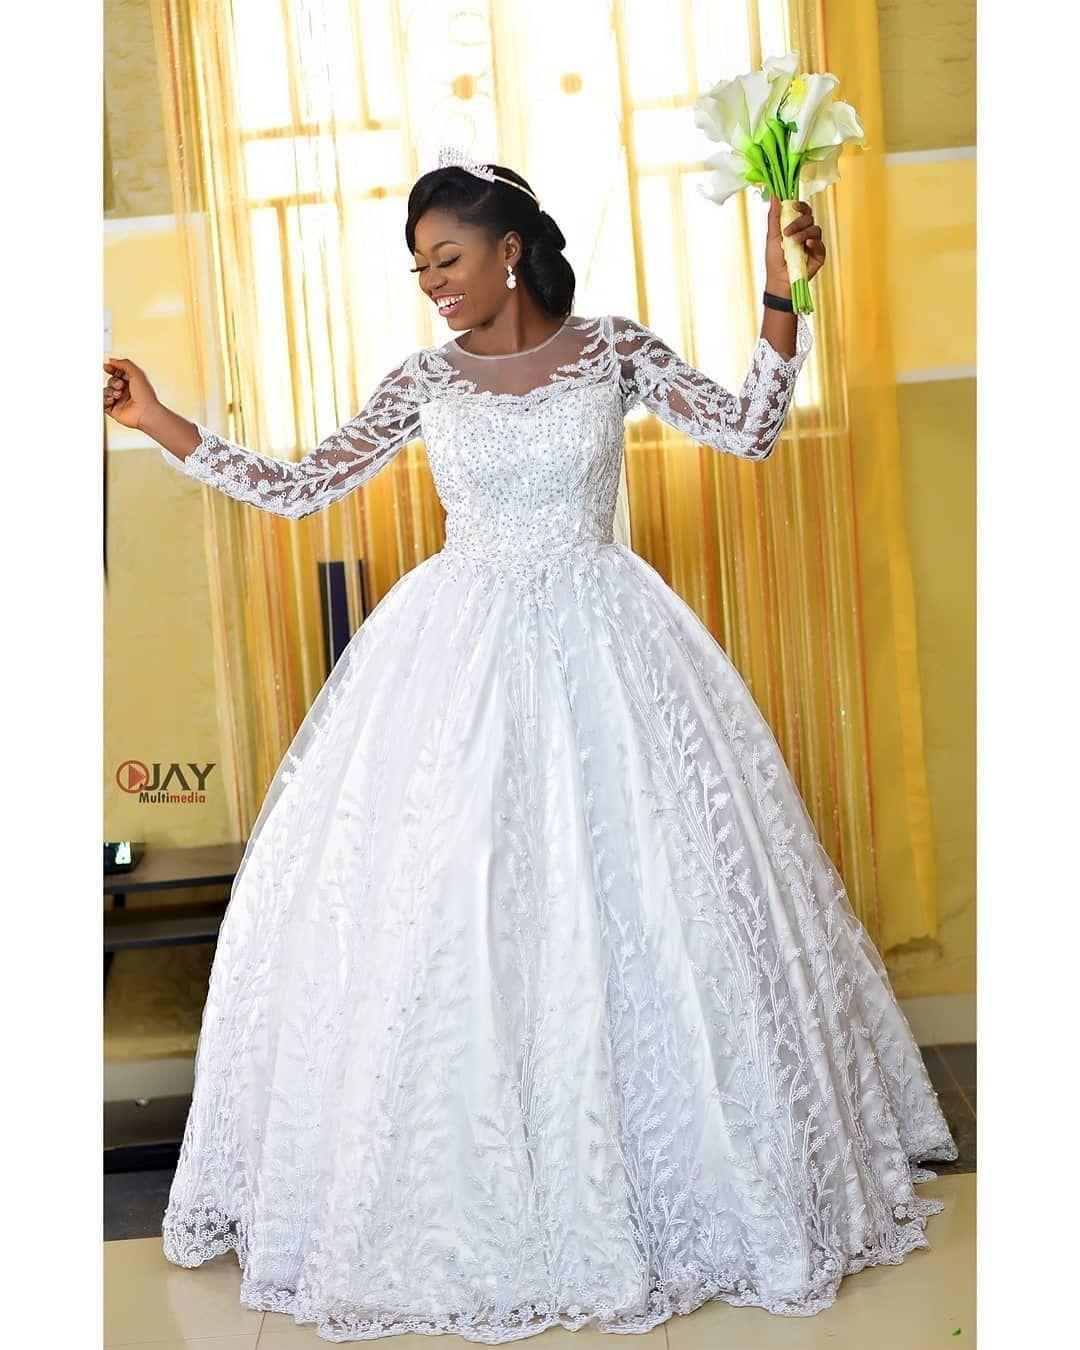 Nigerian Wedding Gown Styles In 2020 Latest Wedding Gowns Nigerian Wedding Dress Wedding Gown Shape